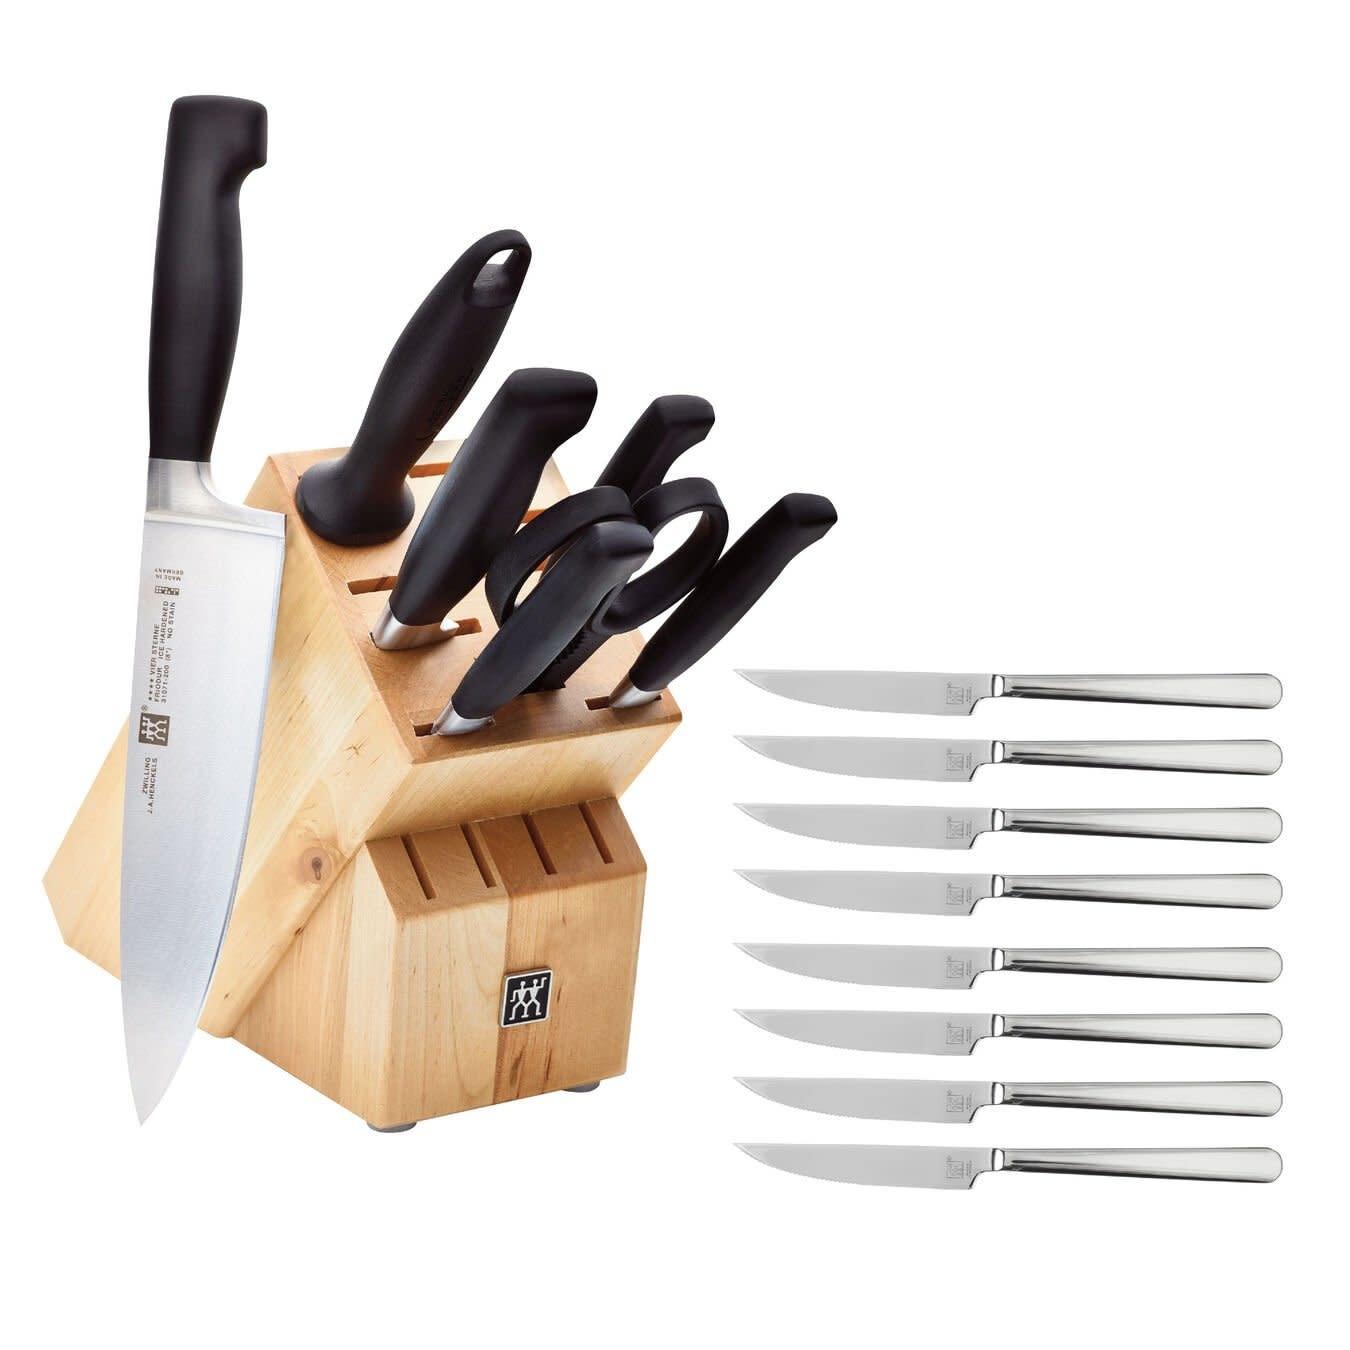 ZWILLING Four Star Knife Block Set 8pc wb/ 8 Steak Knives